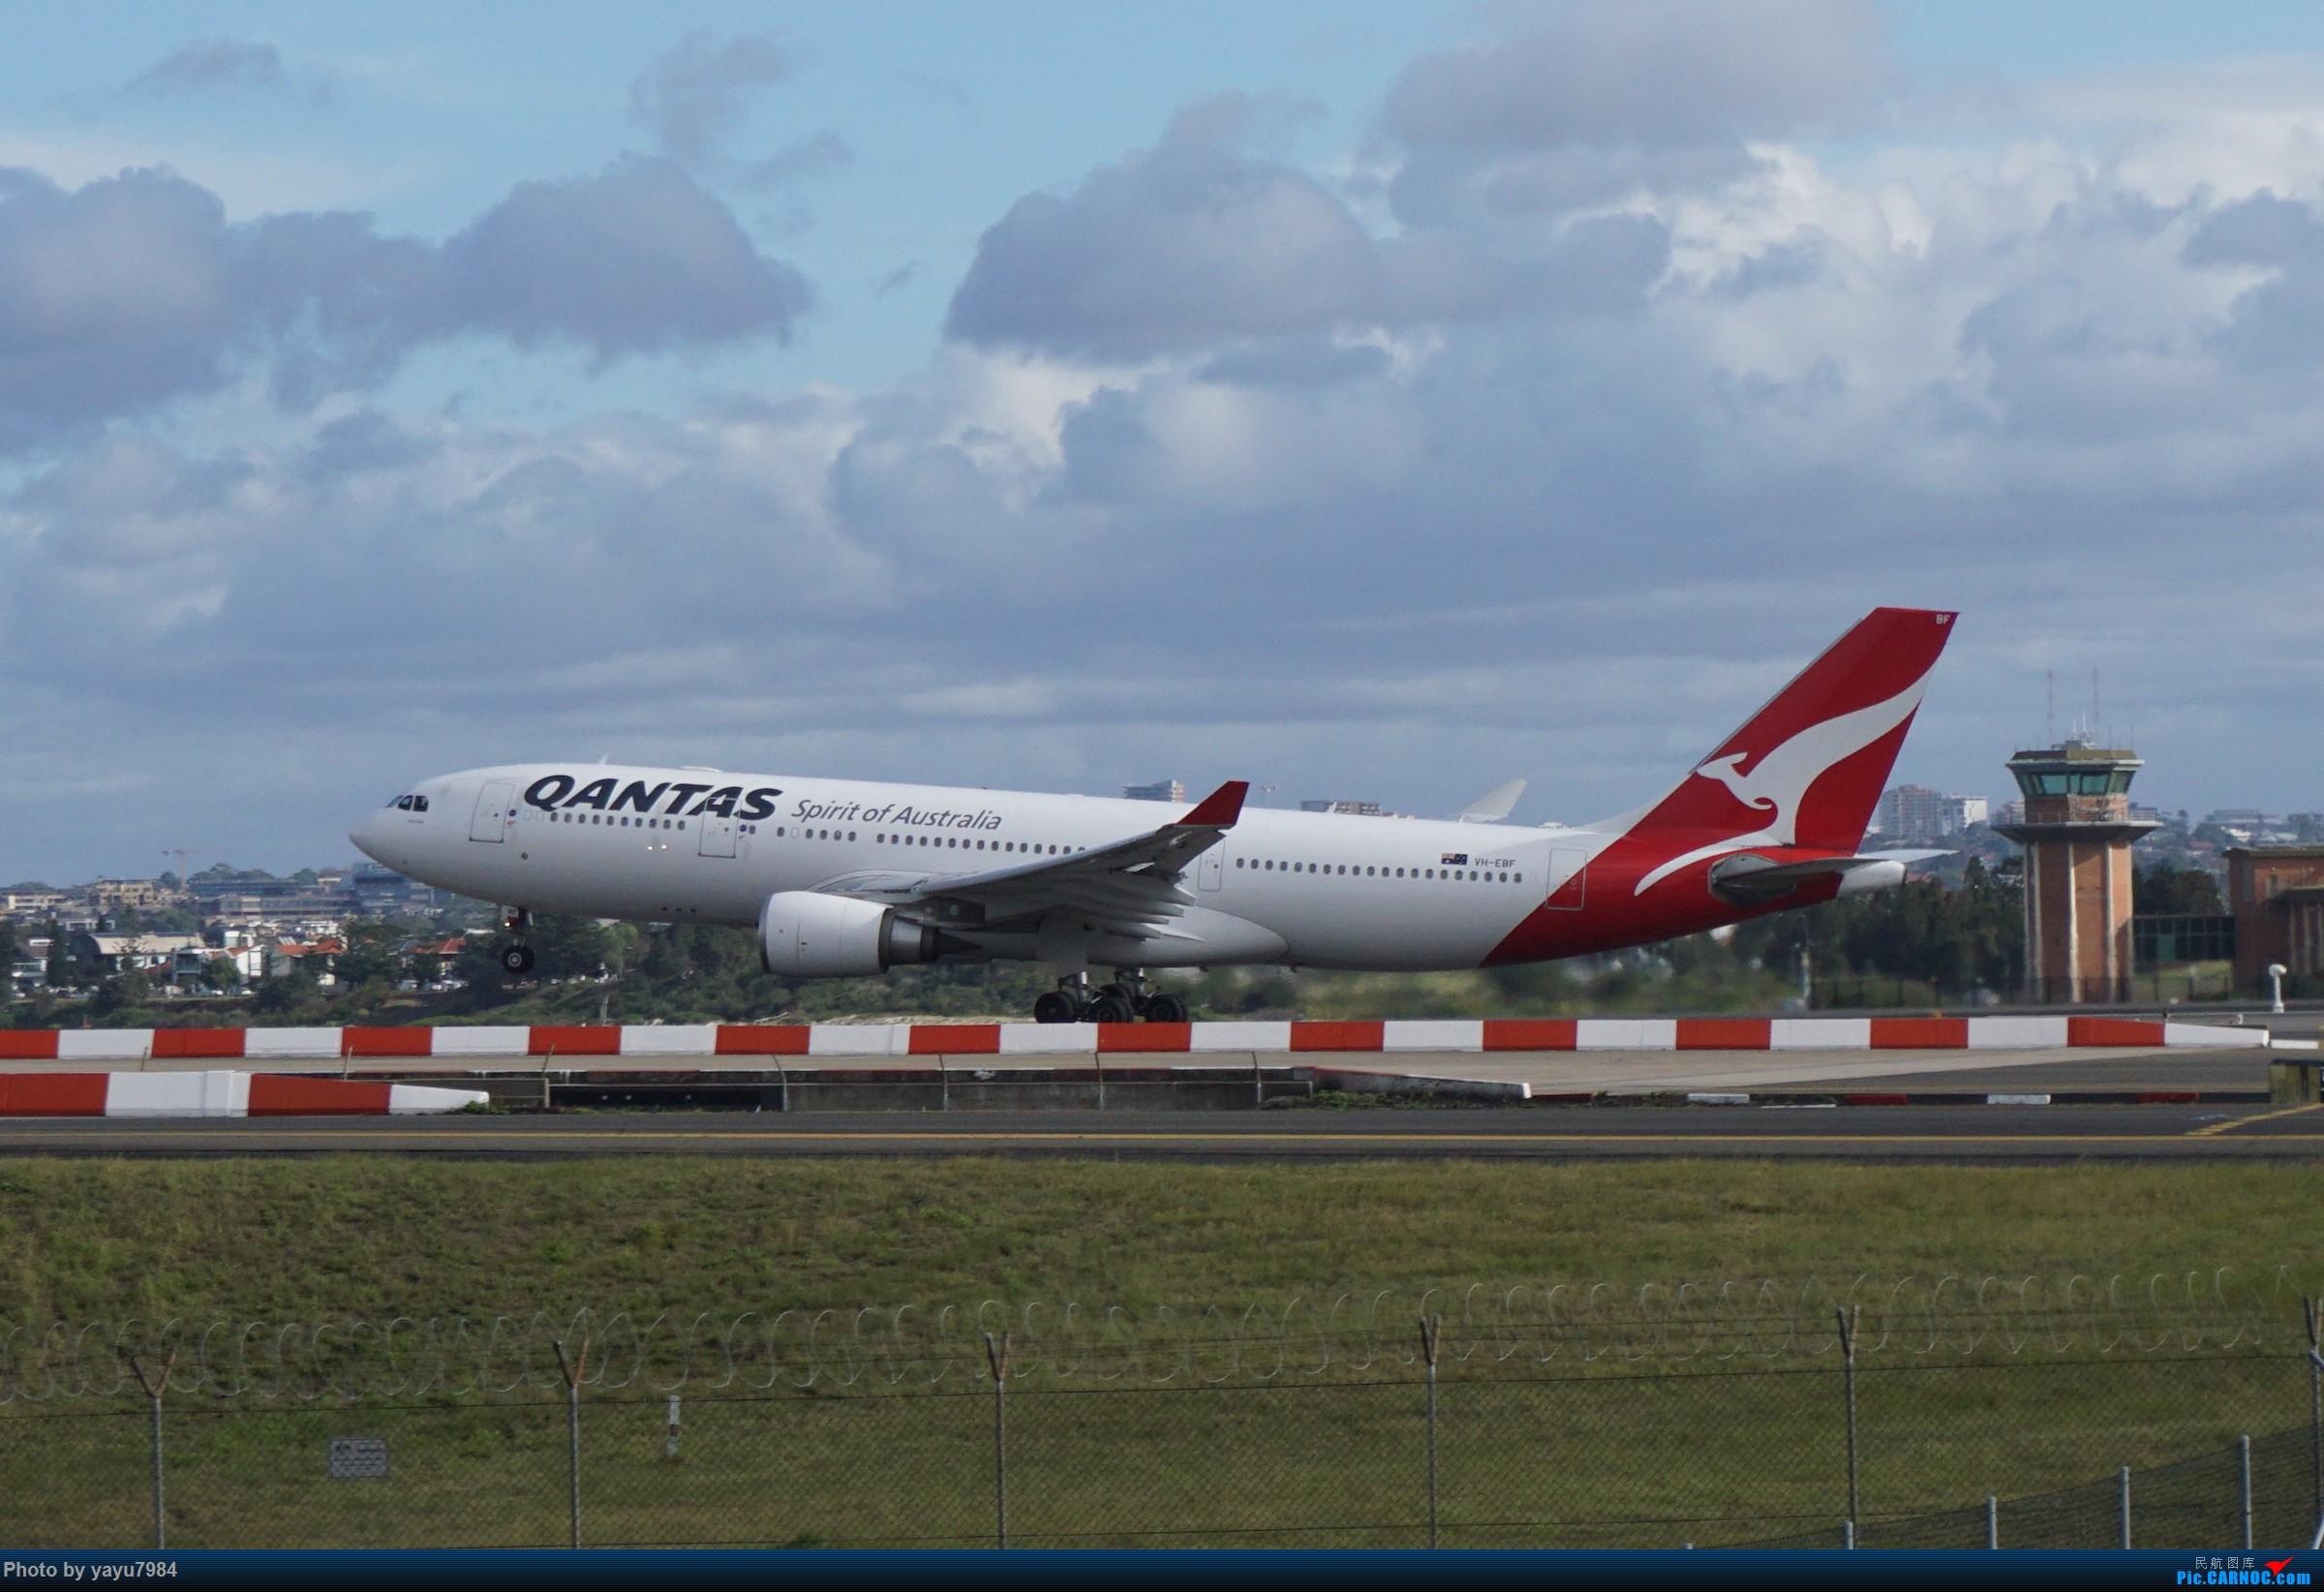 Re:[原创][SYD] 近期随摄,收获颇多 AIRBUS A330-200 VH-EBF 澳大利亚悉尼金斯福德·史密斯机场